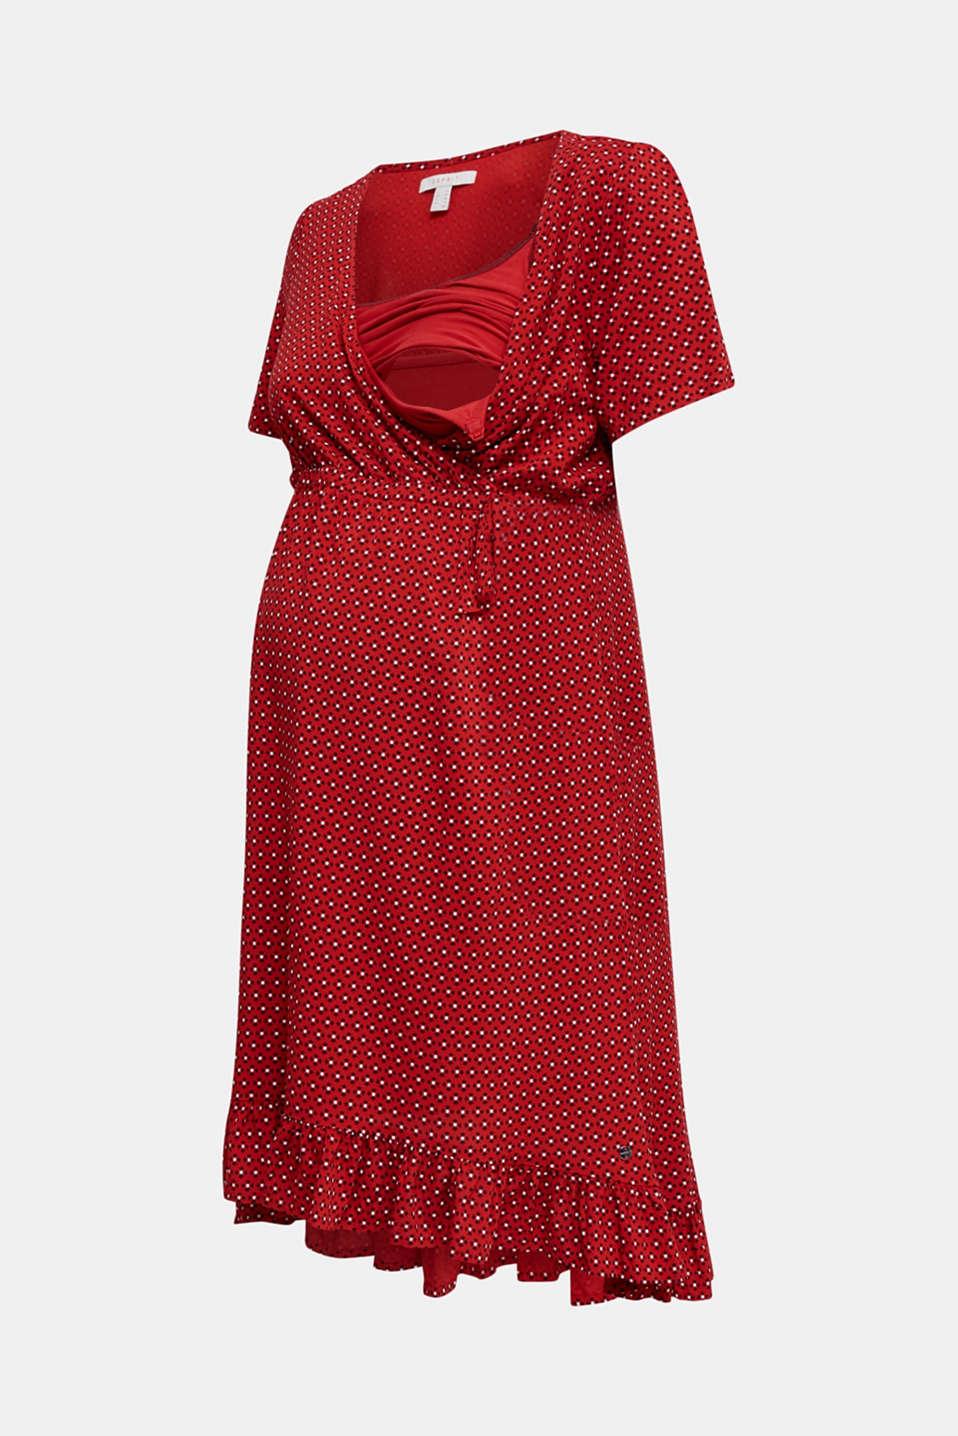 Nursing wrap dress, LCRED, detail image number 4